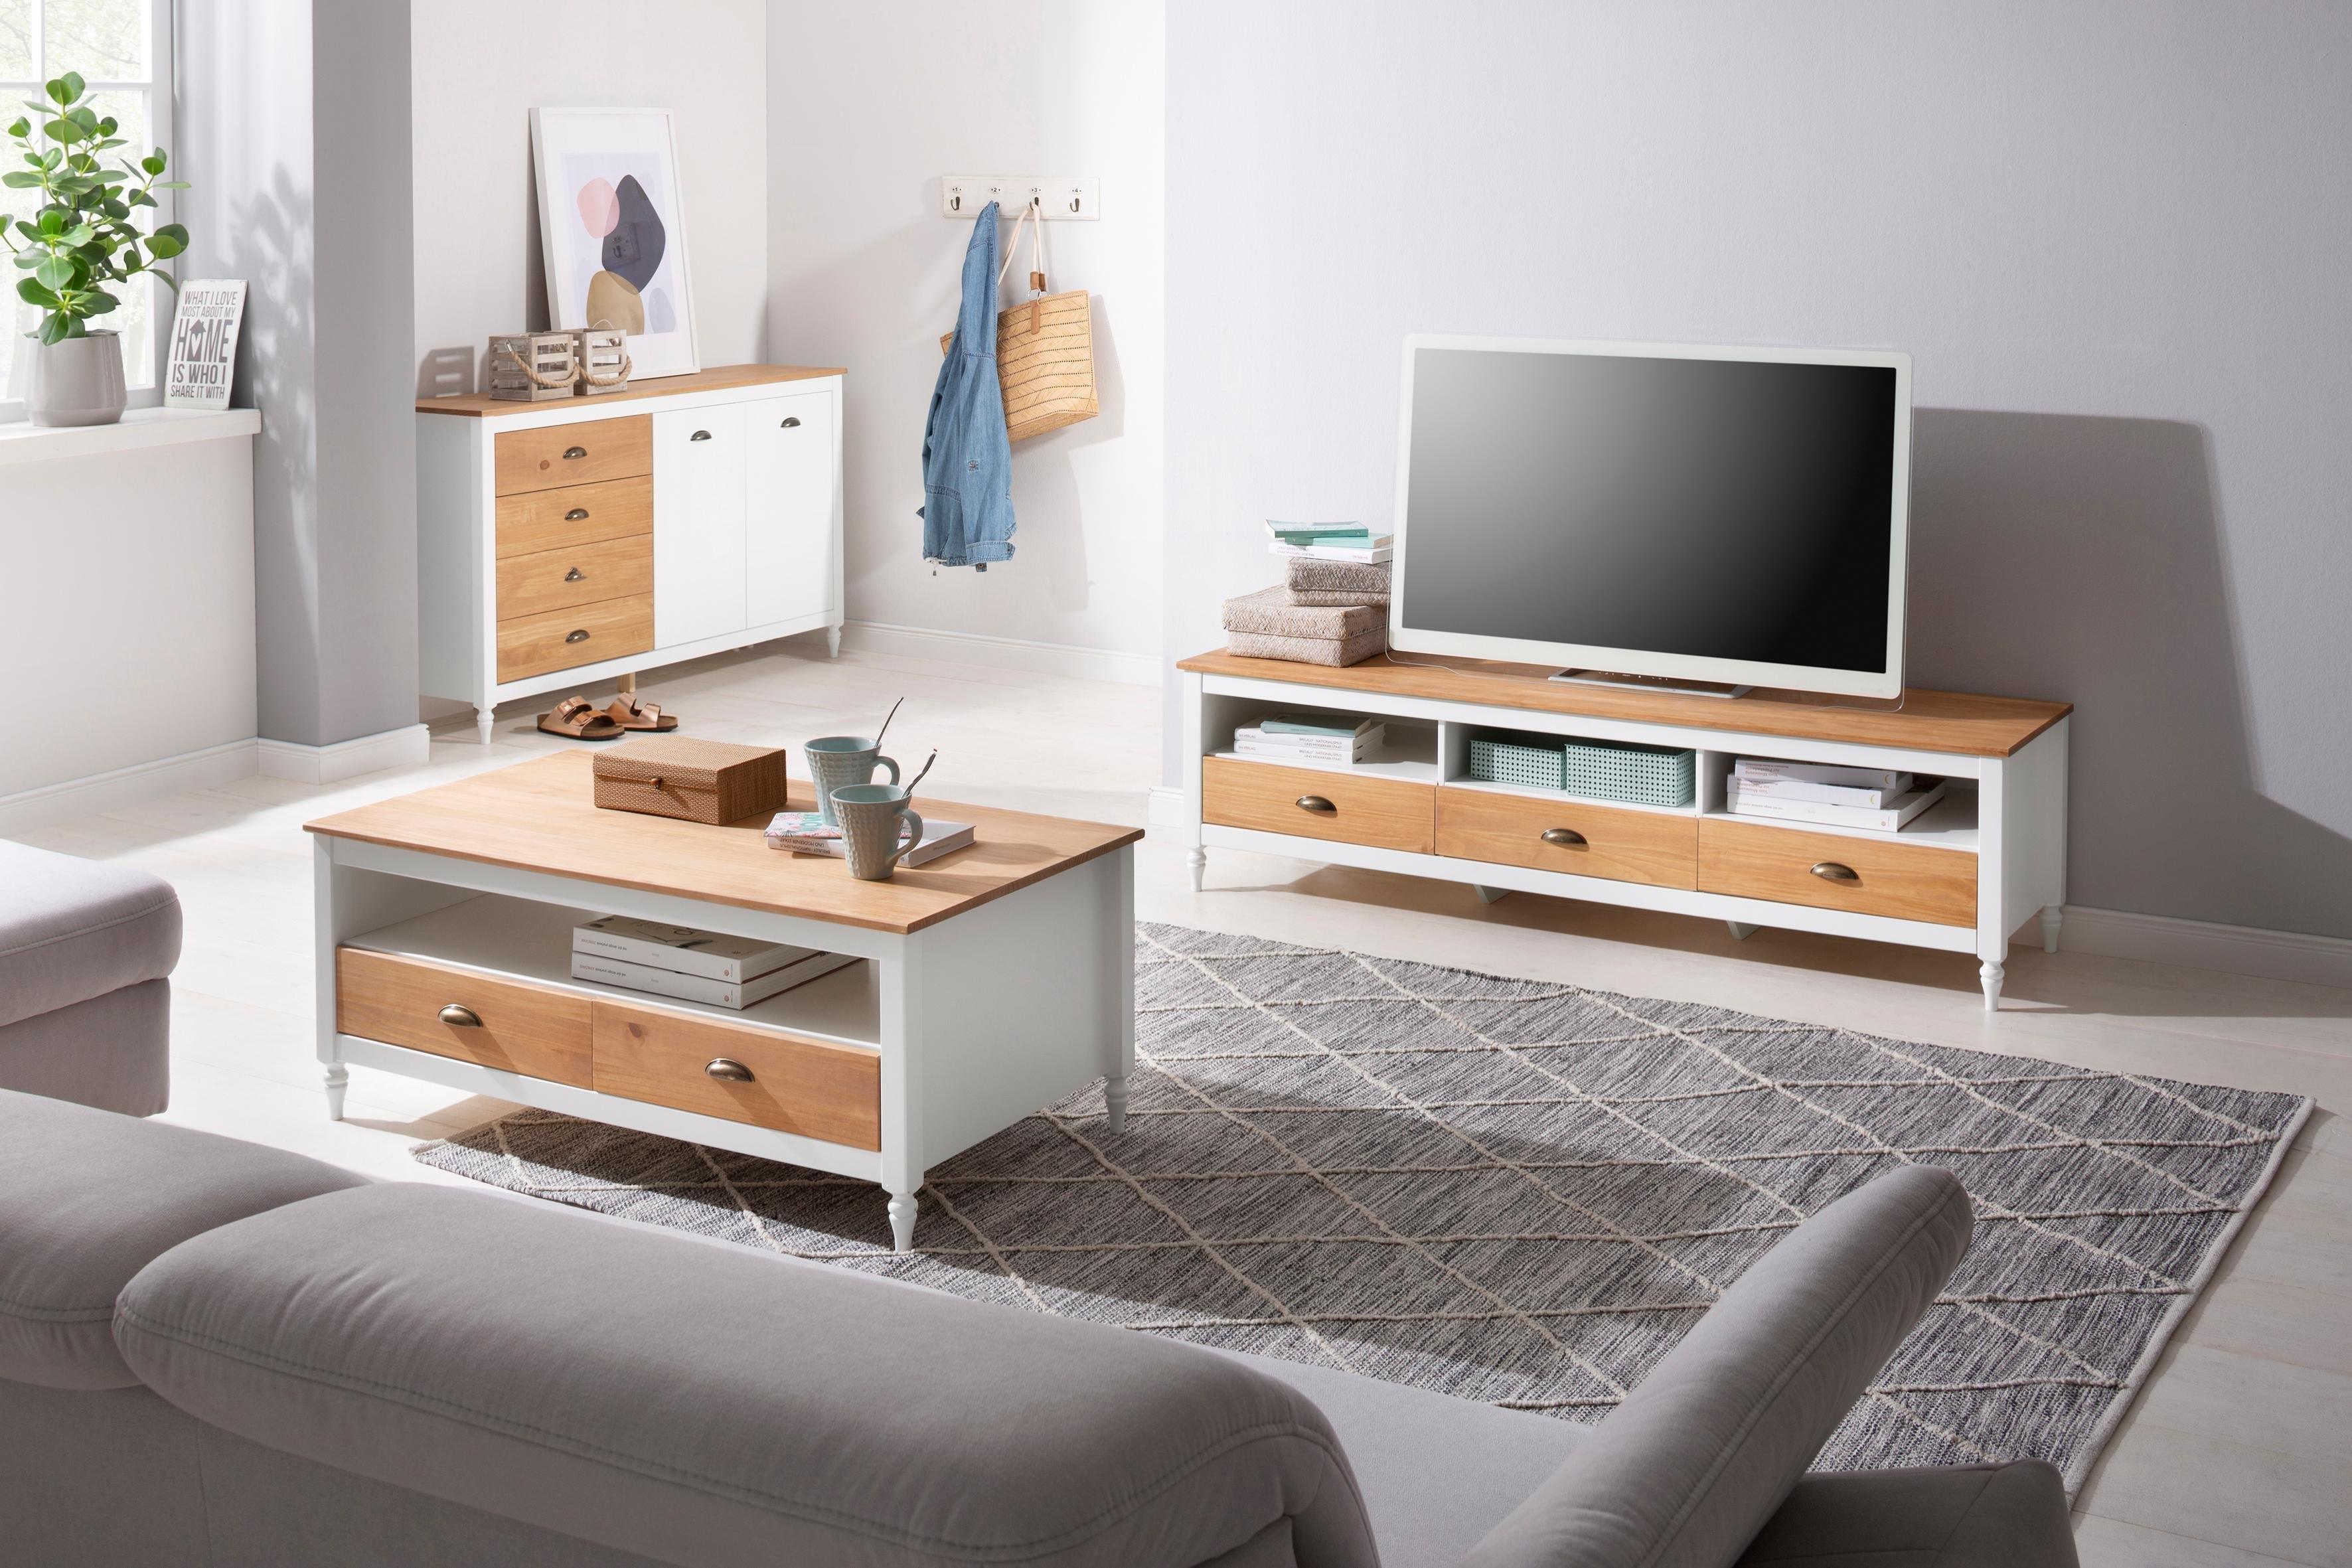 Home affaire tv-meubel »Fridau« - verschillende betaalmethodes